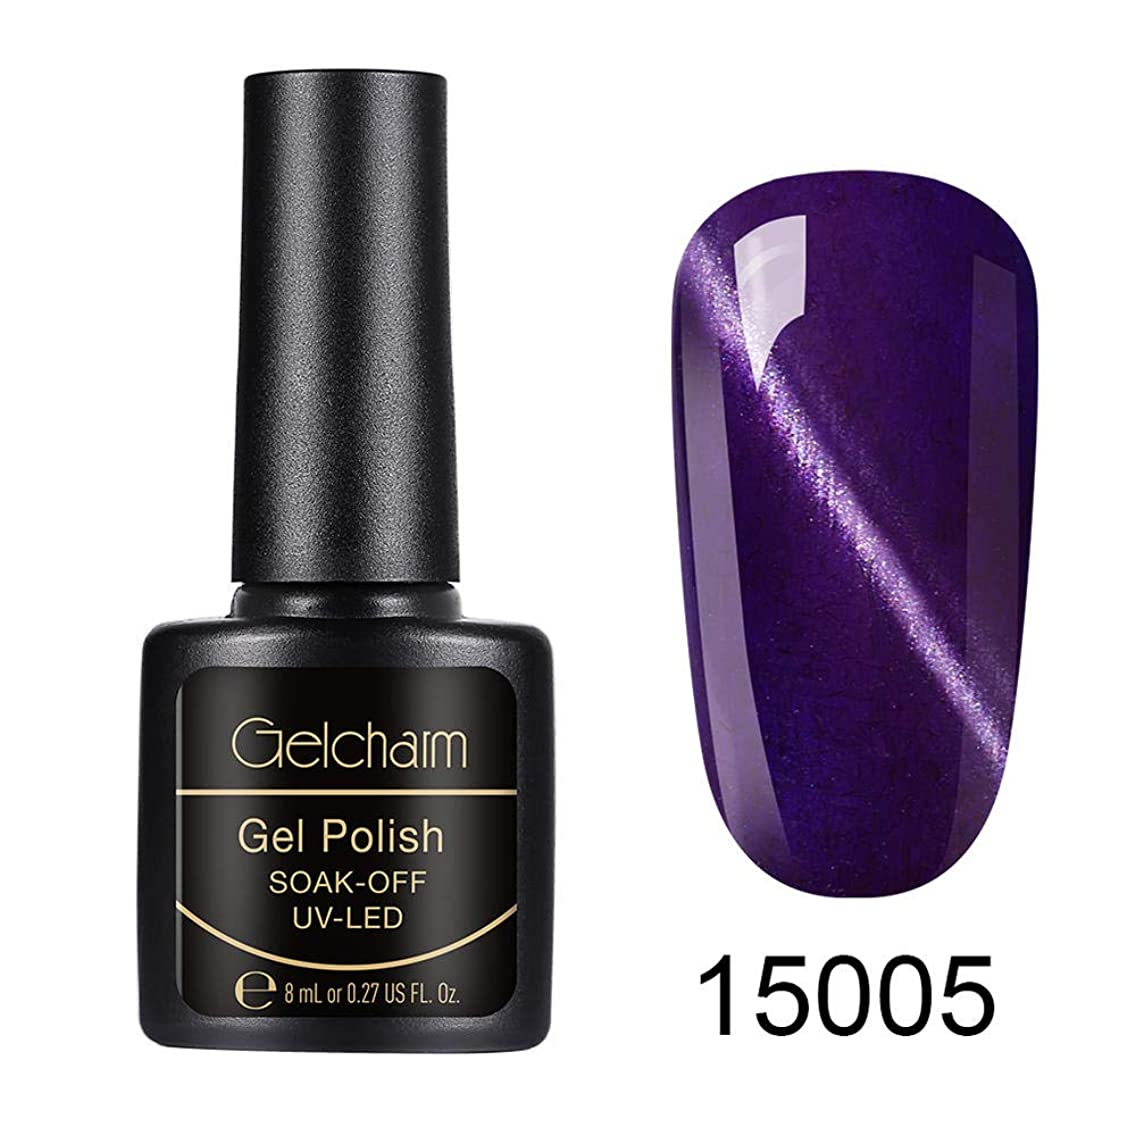 Gelcharm Furcoat Cat Eye Gel Polish Gel Polish UV LED Soak Off Gel Nail Varnish Gloss Nail Art Salon Manicure 8ML 15005